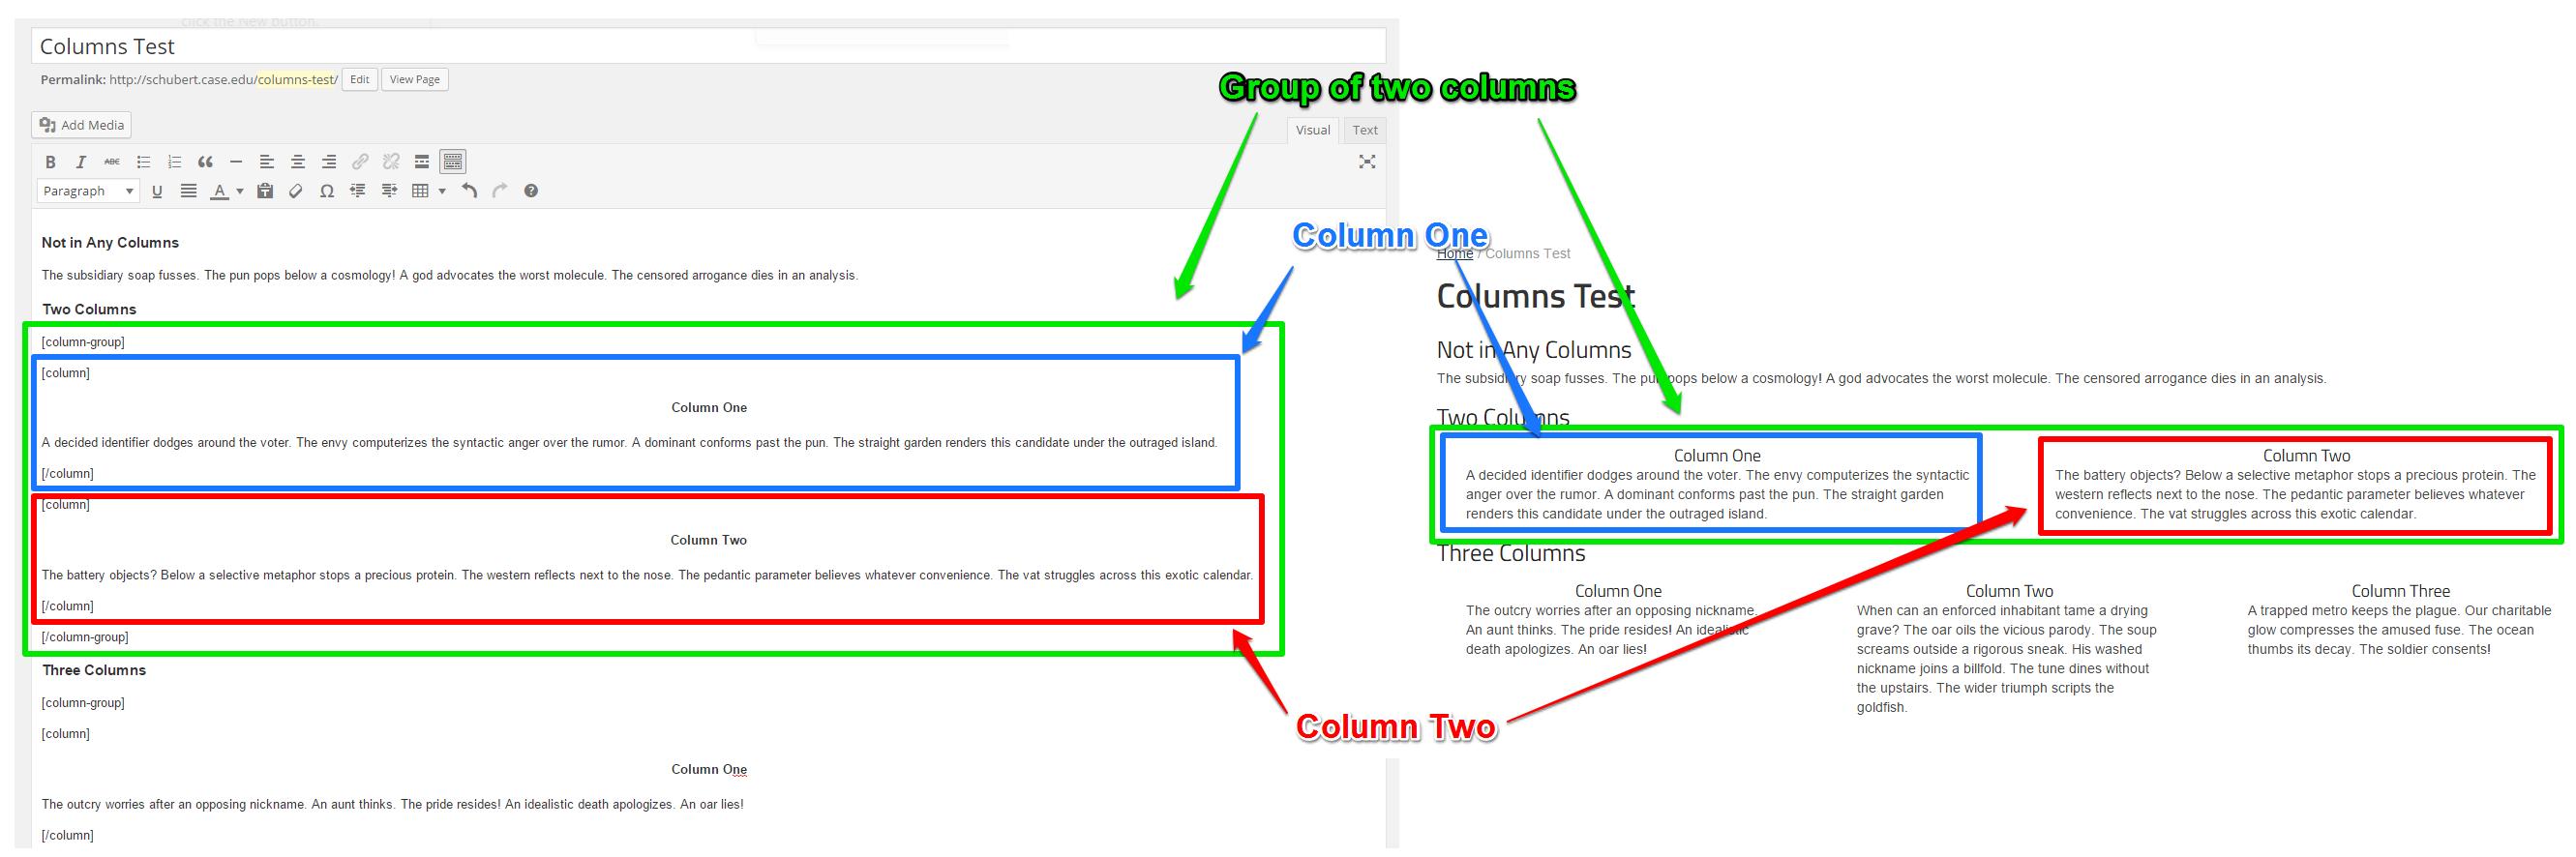 Columns Comparision 1